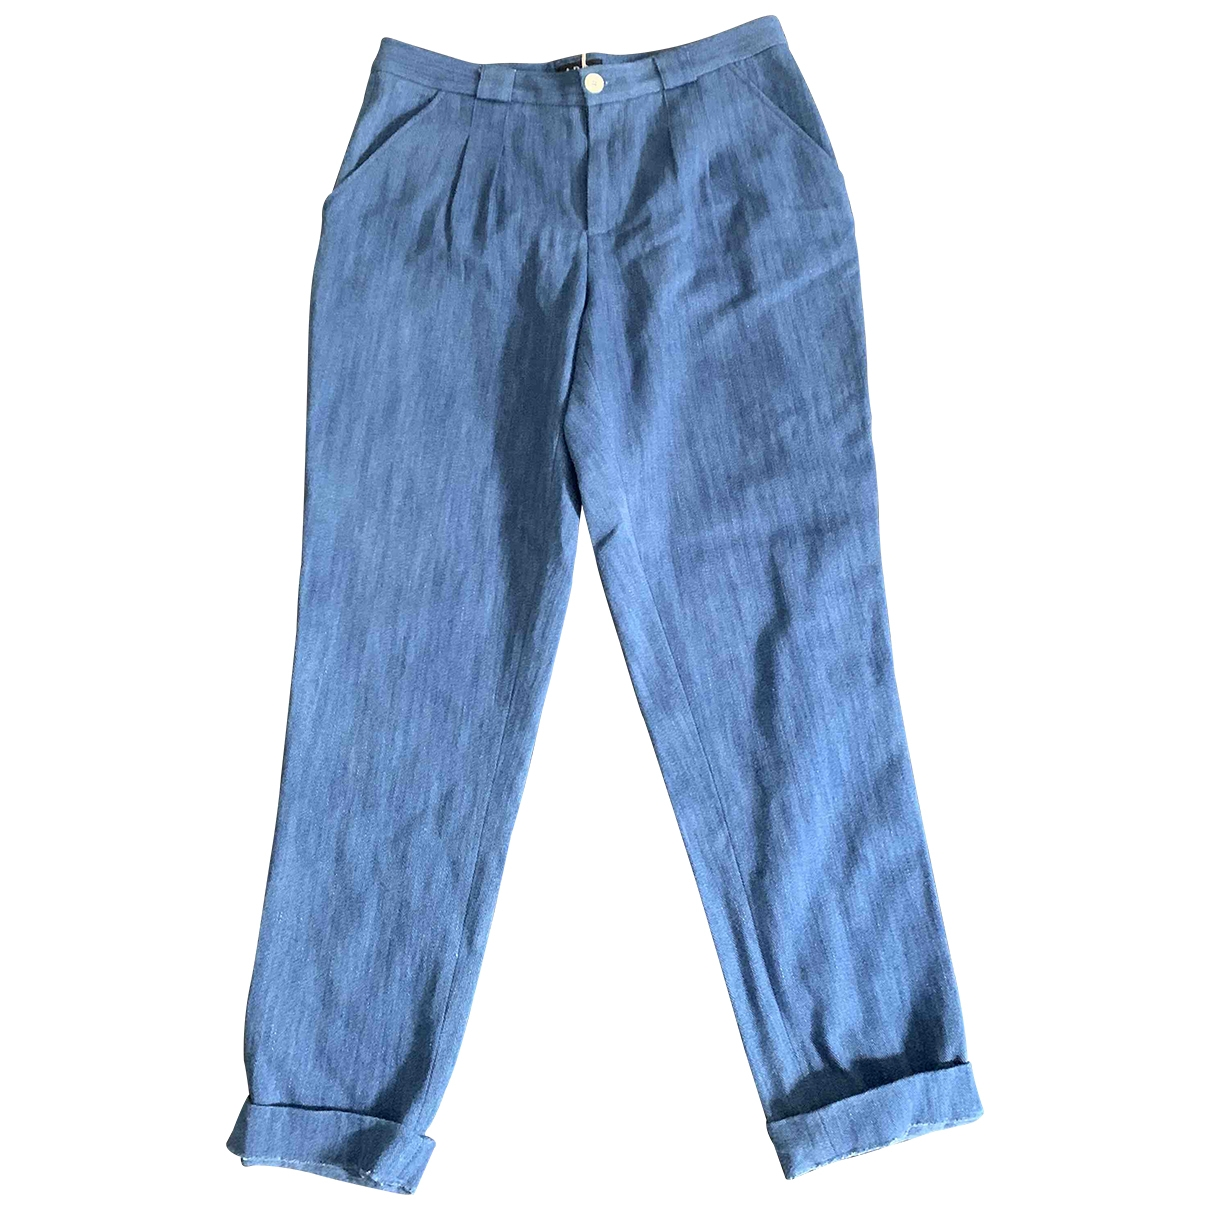 Apc \N Blue Cotton Trousers for Women 40 FR